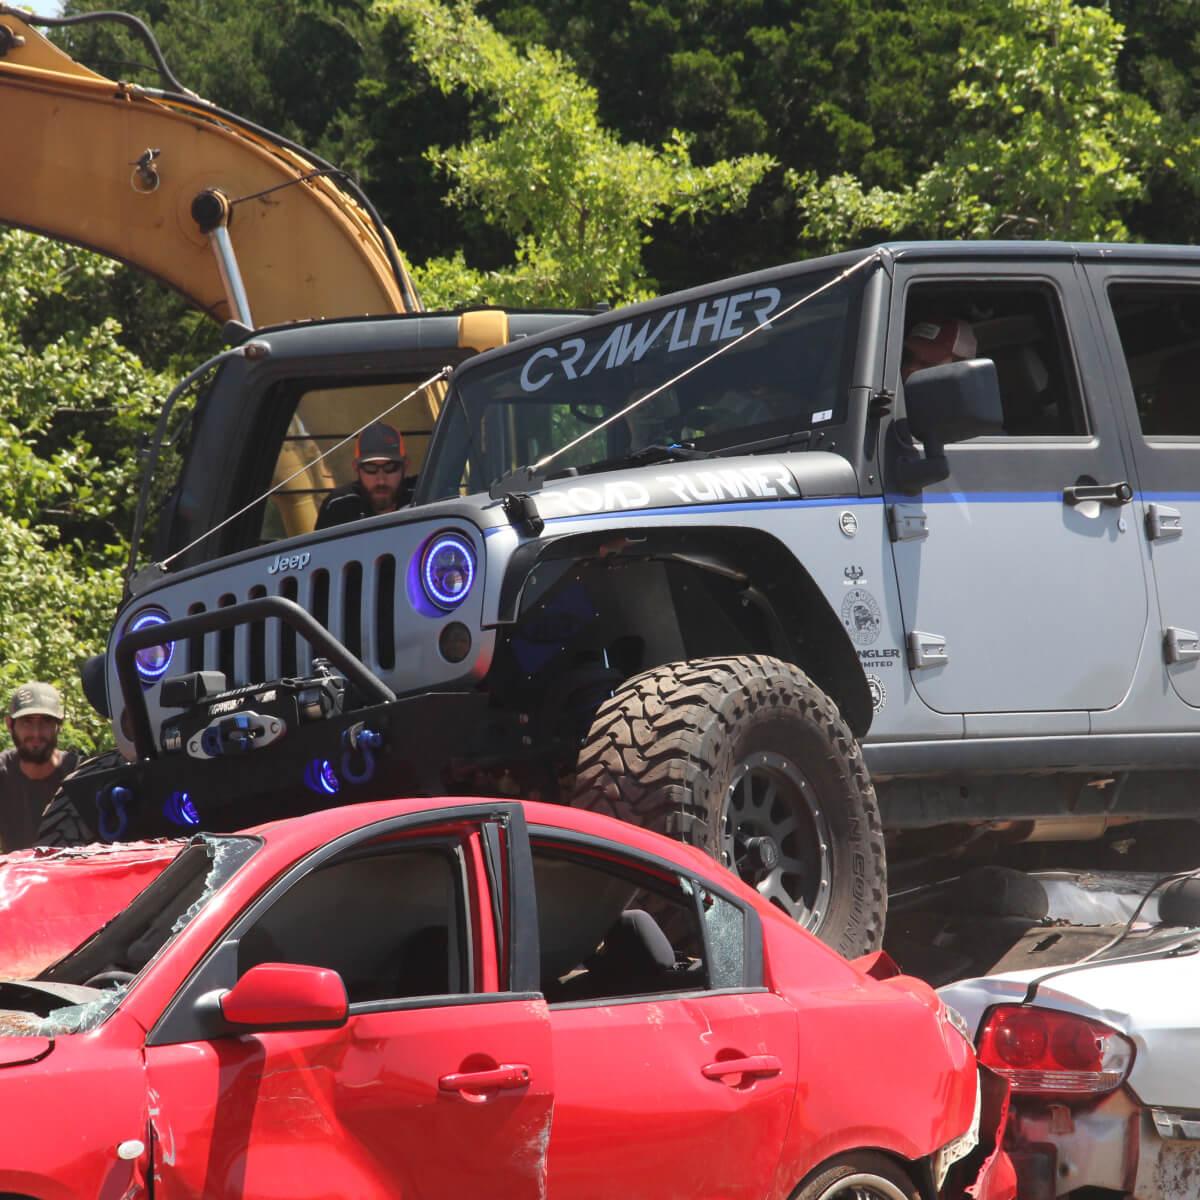 Jeep on Cars